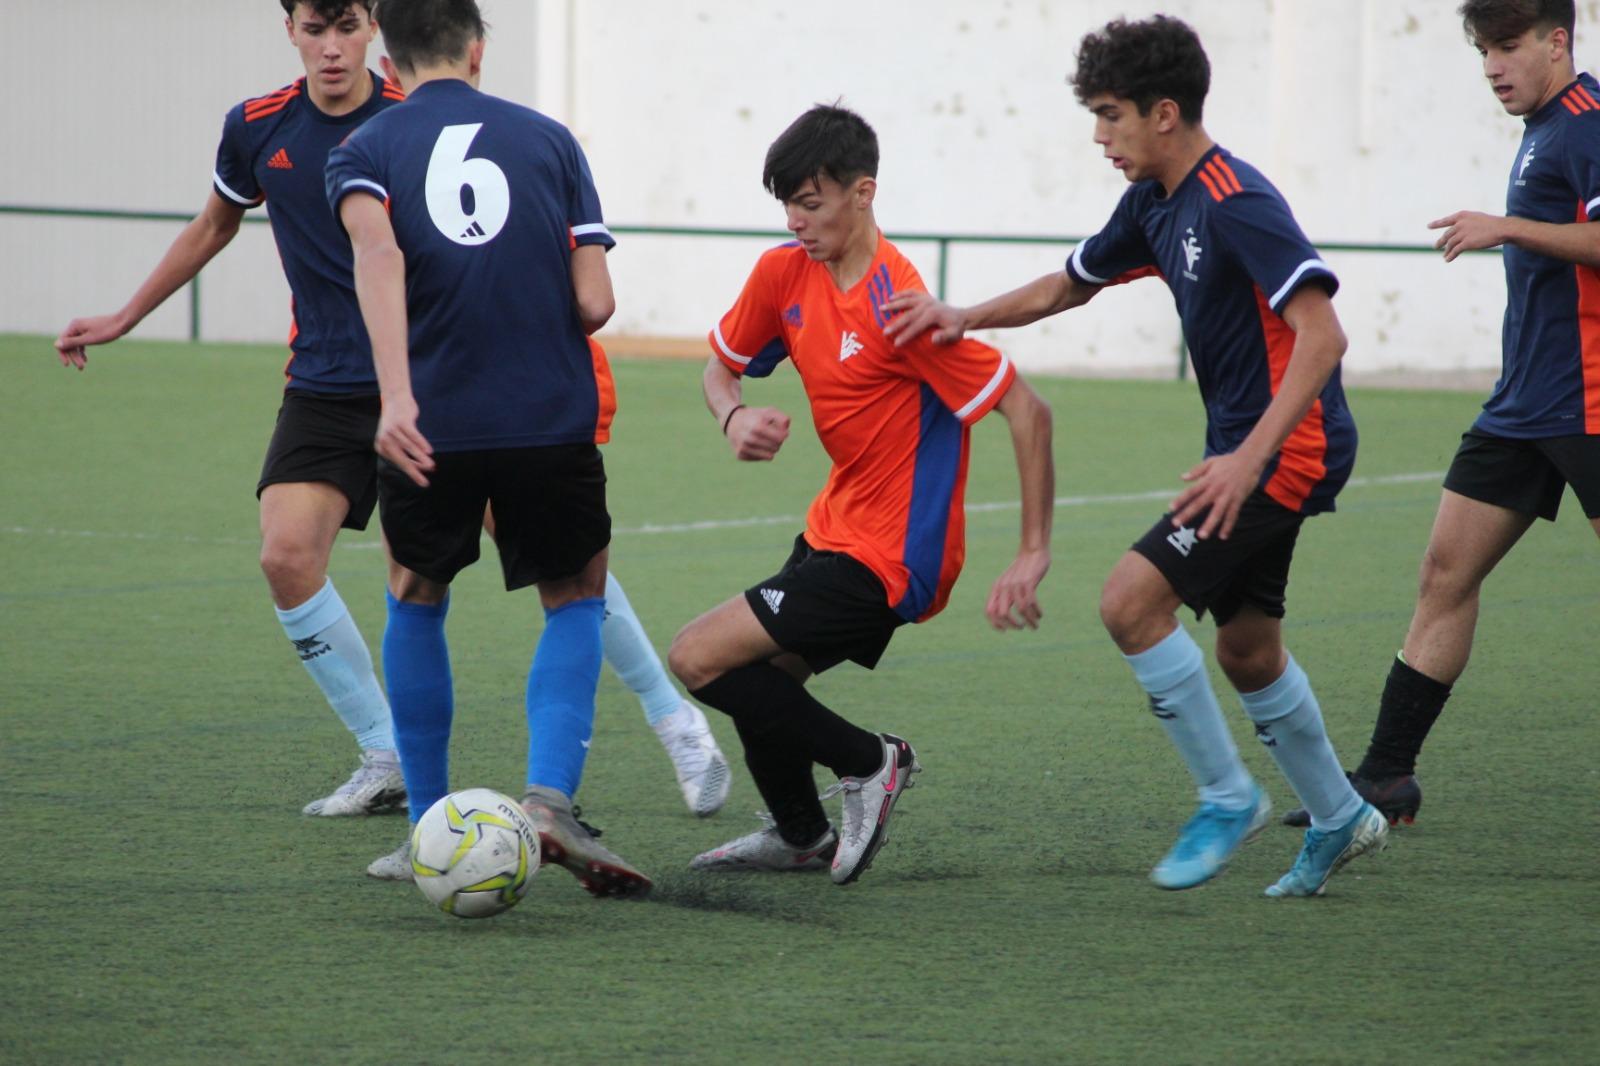 16 dic Amistoso Selecció Valenciana sub16 Lafora